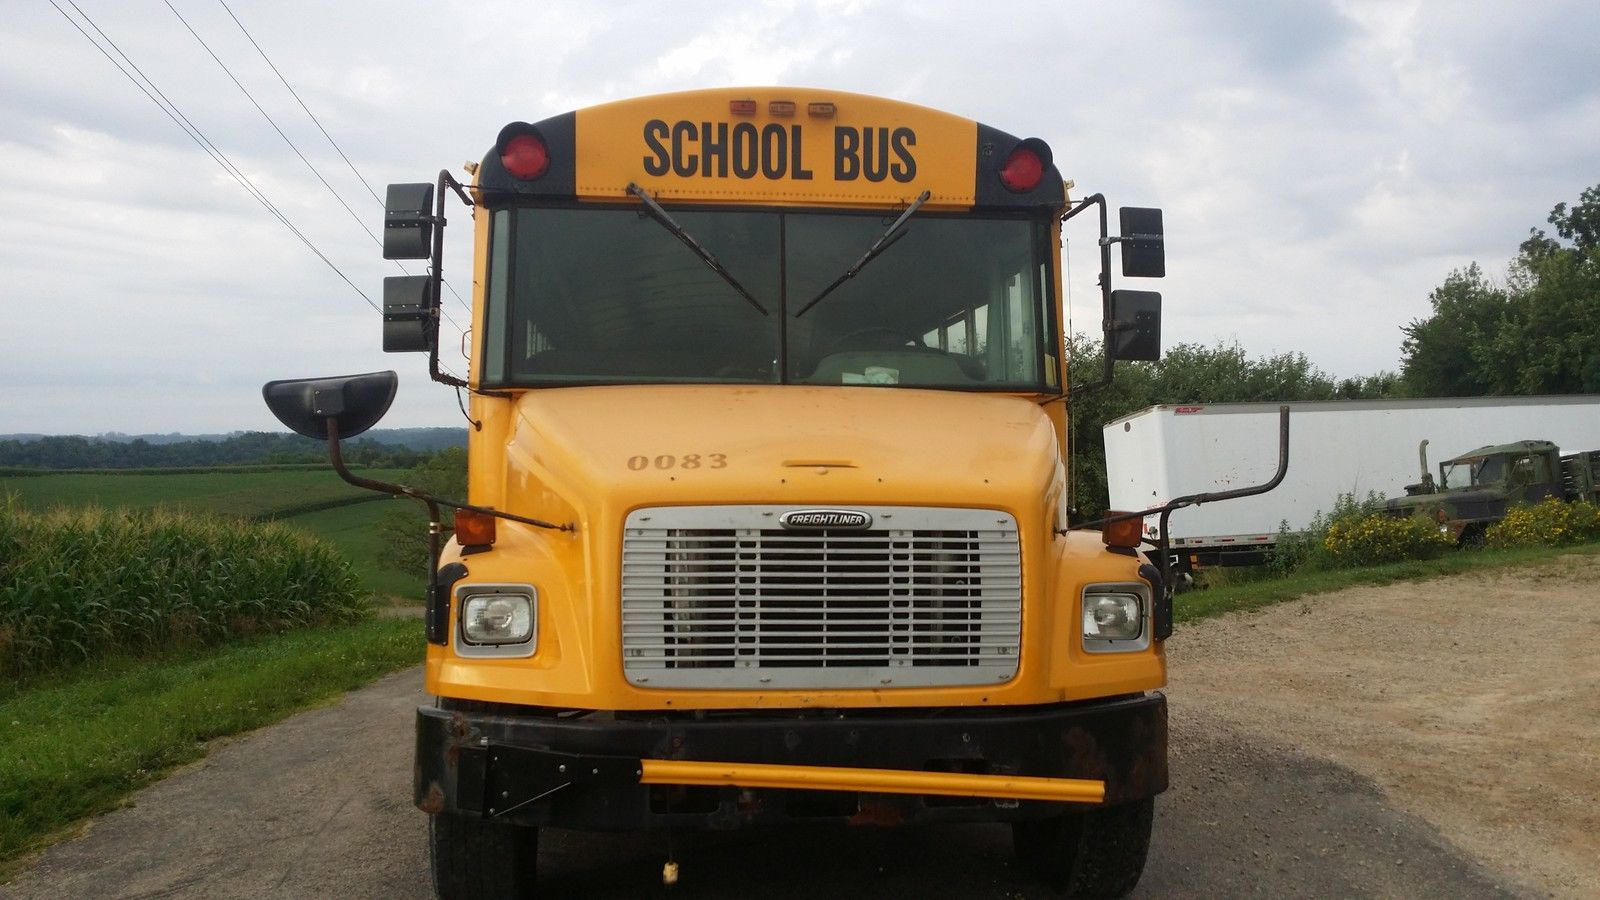 2005 Freightliner Thomas School Bus School bus for sale